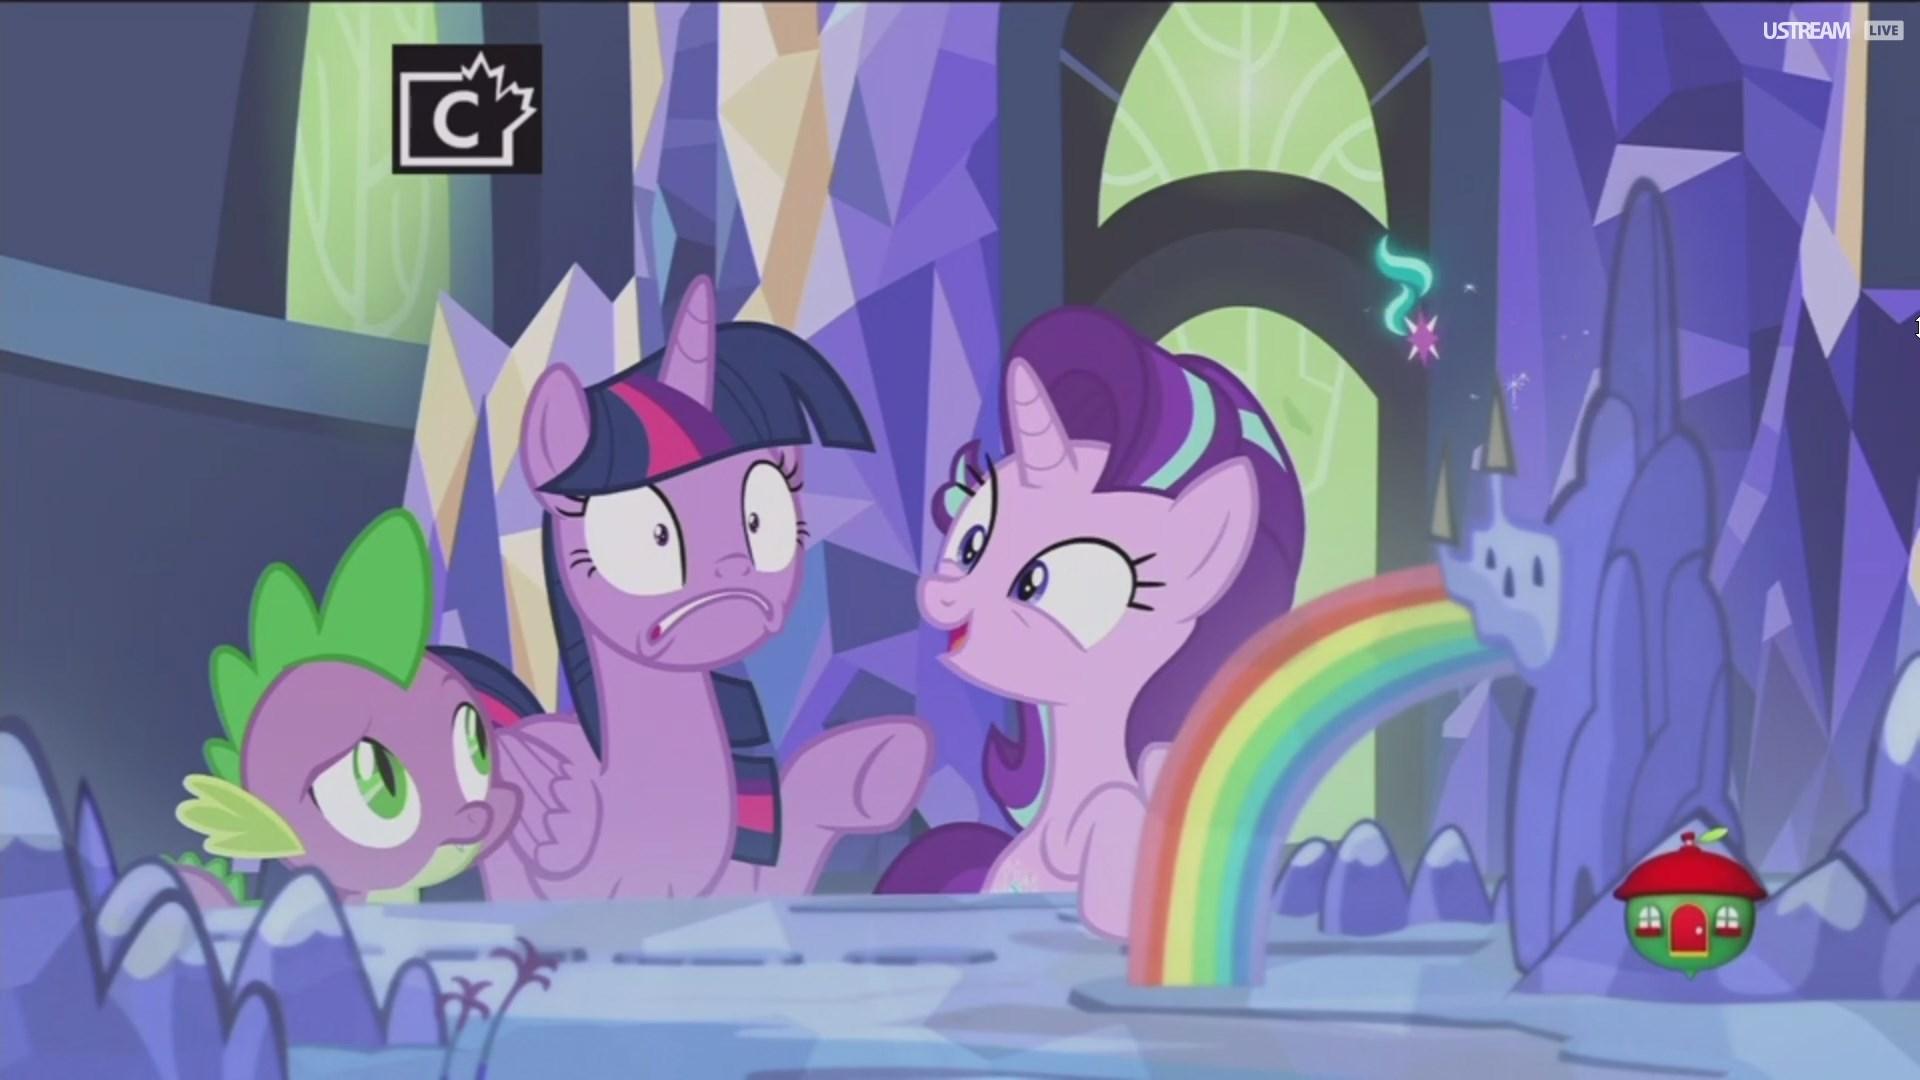 USTREAM LIVE Twilight Sparkle Princess Celestia Luna Rainbow Dash Cartoon Mammal Purple Vertebrate Art Horse